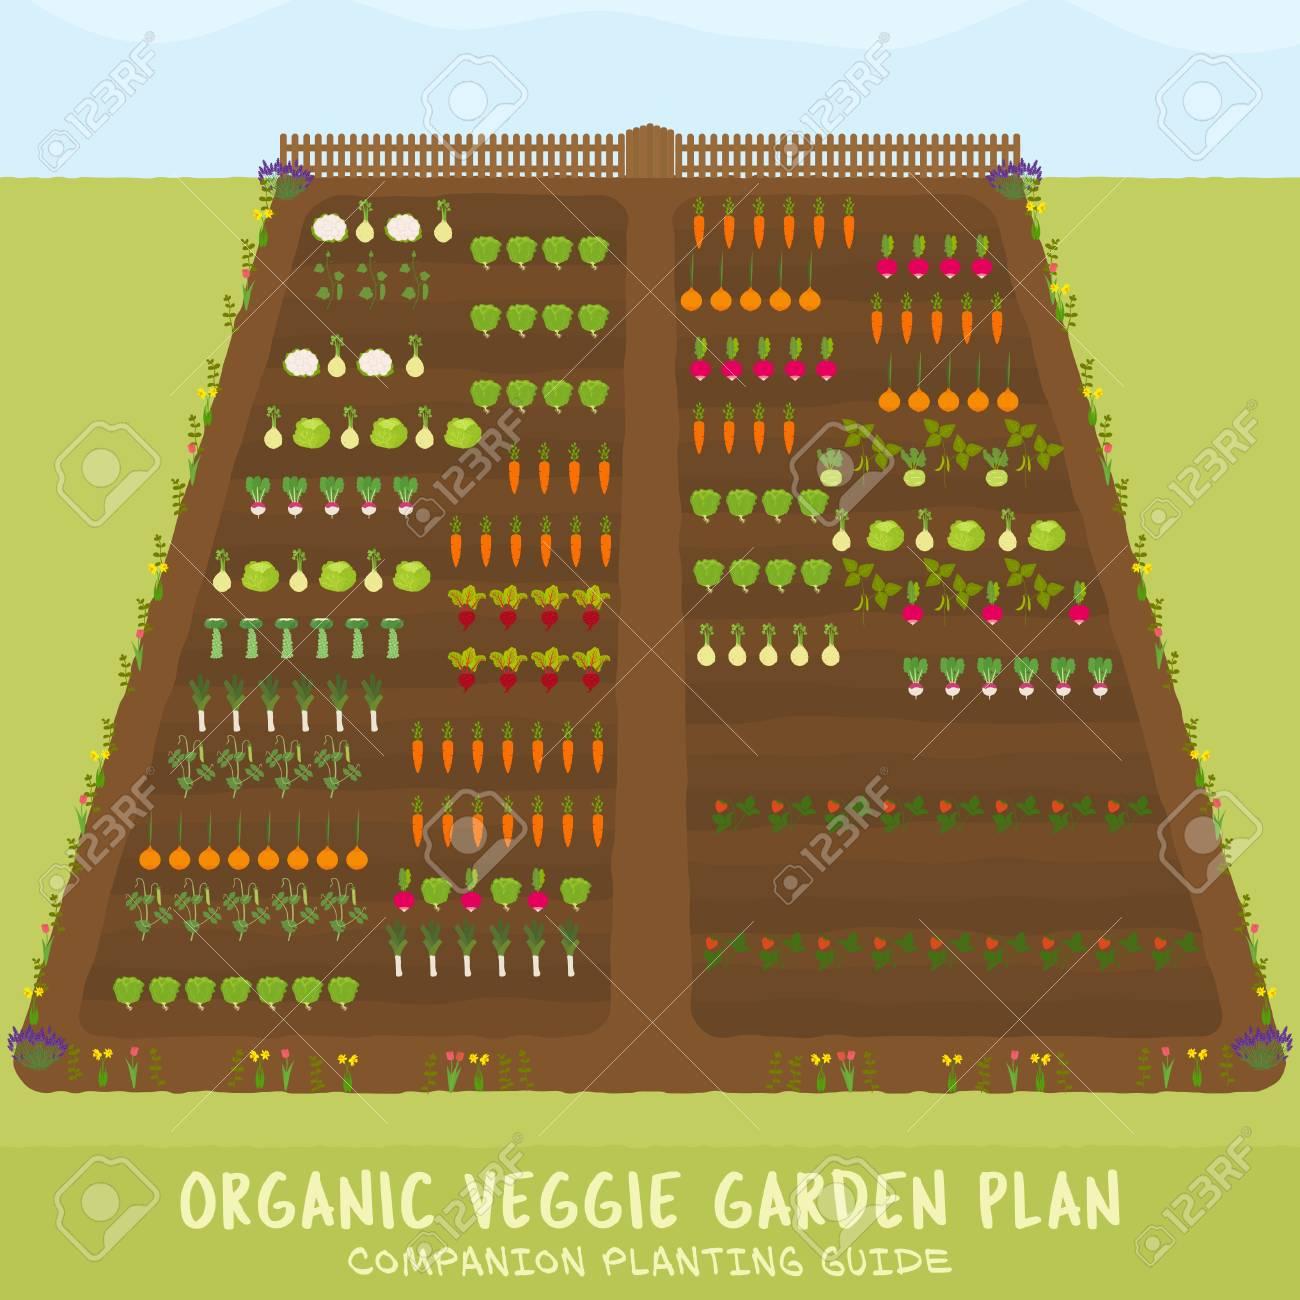 Organic Veggie Garden Plan - Companion Planting Guide - Sowing ...